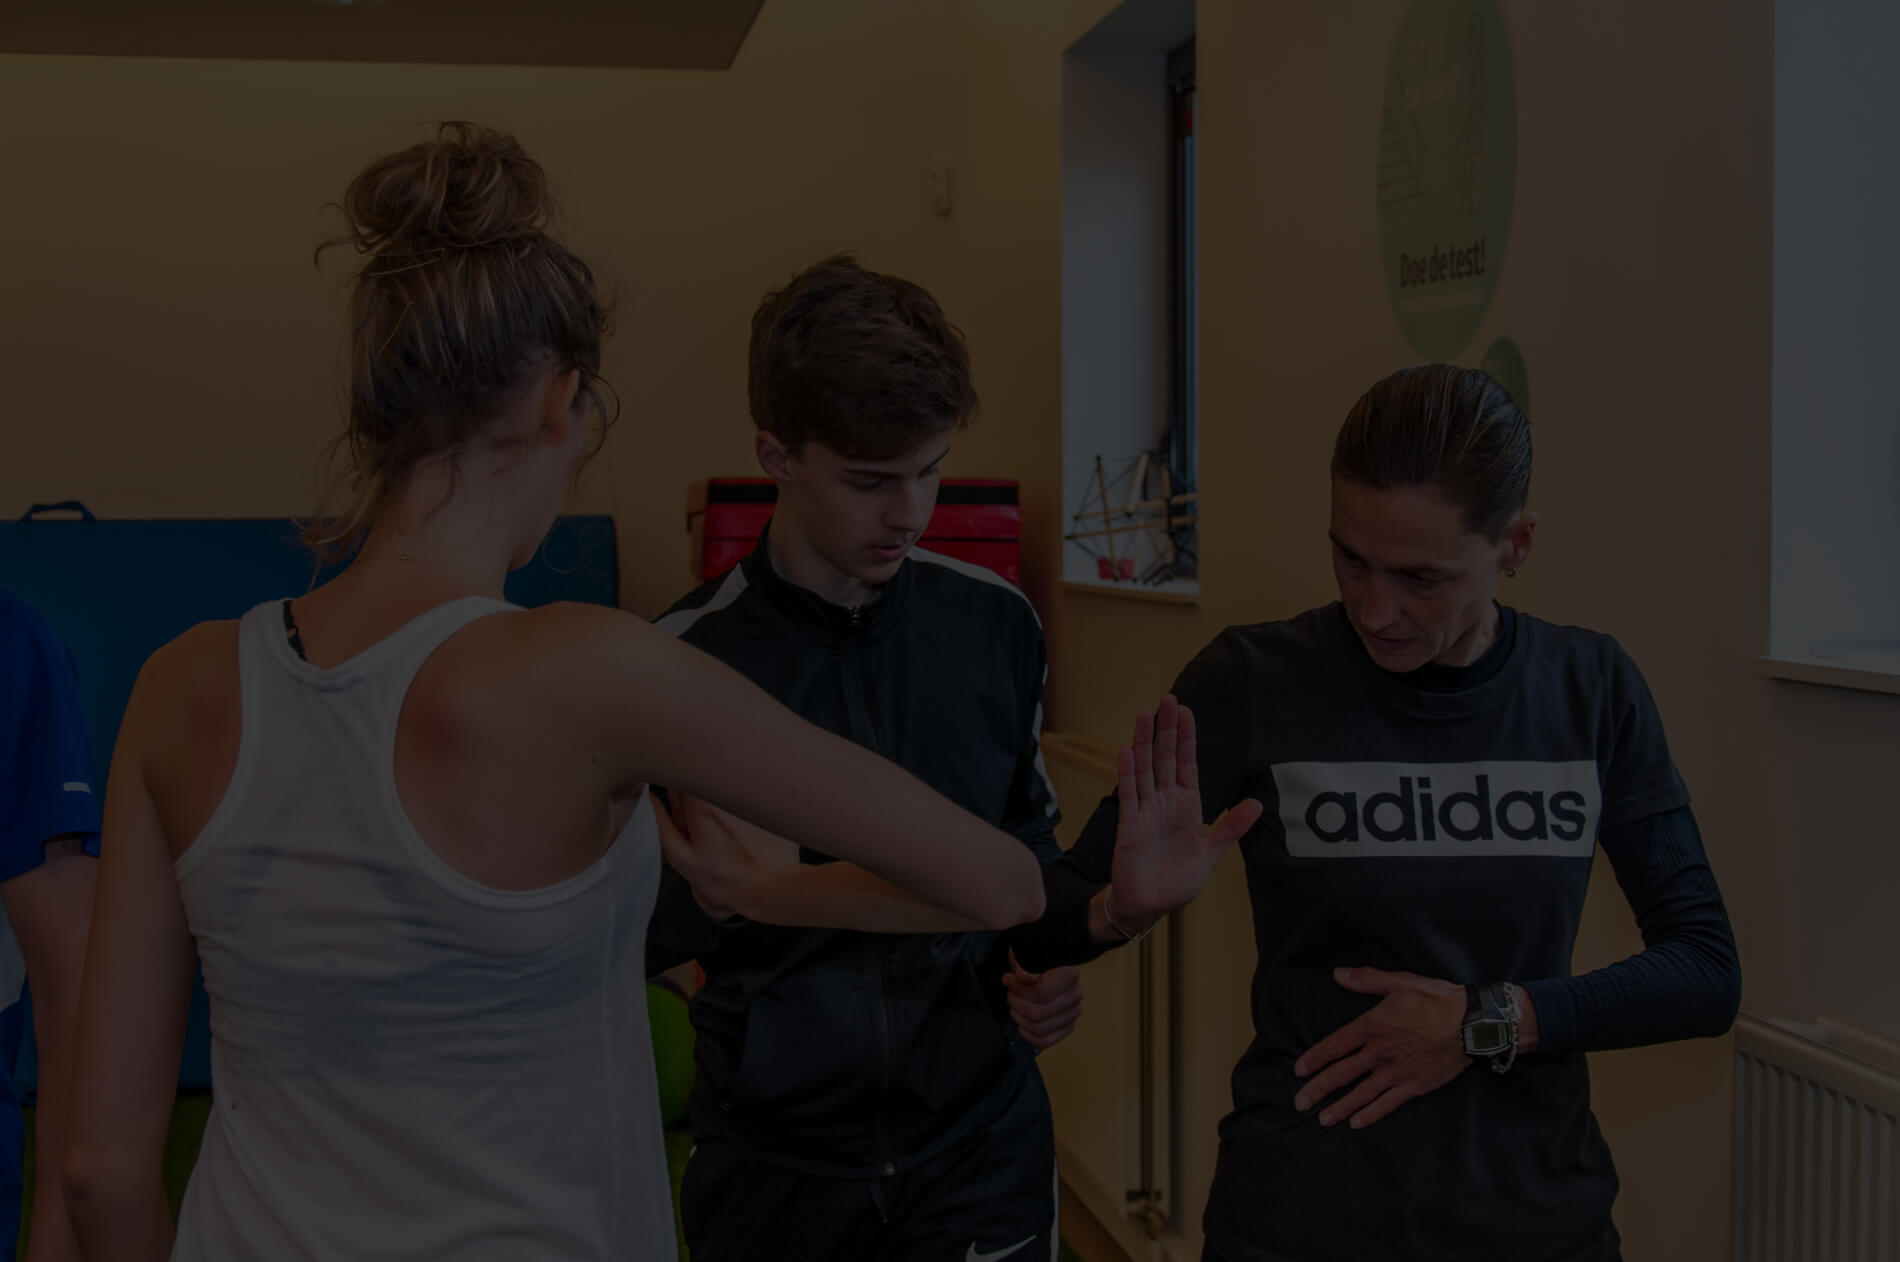 personal coach 4u personal training